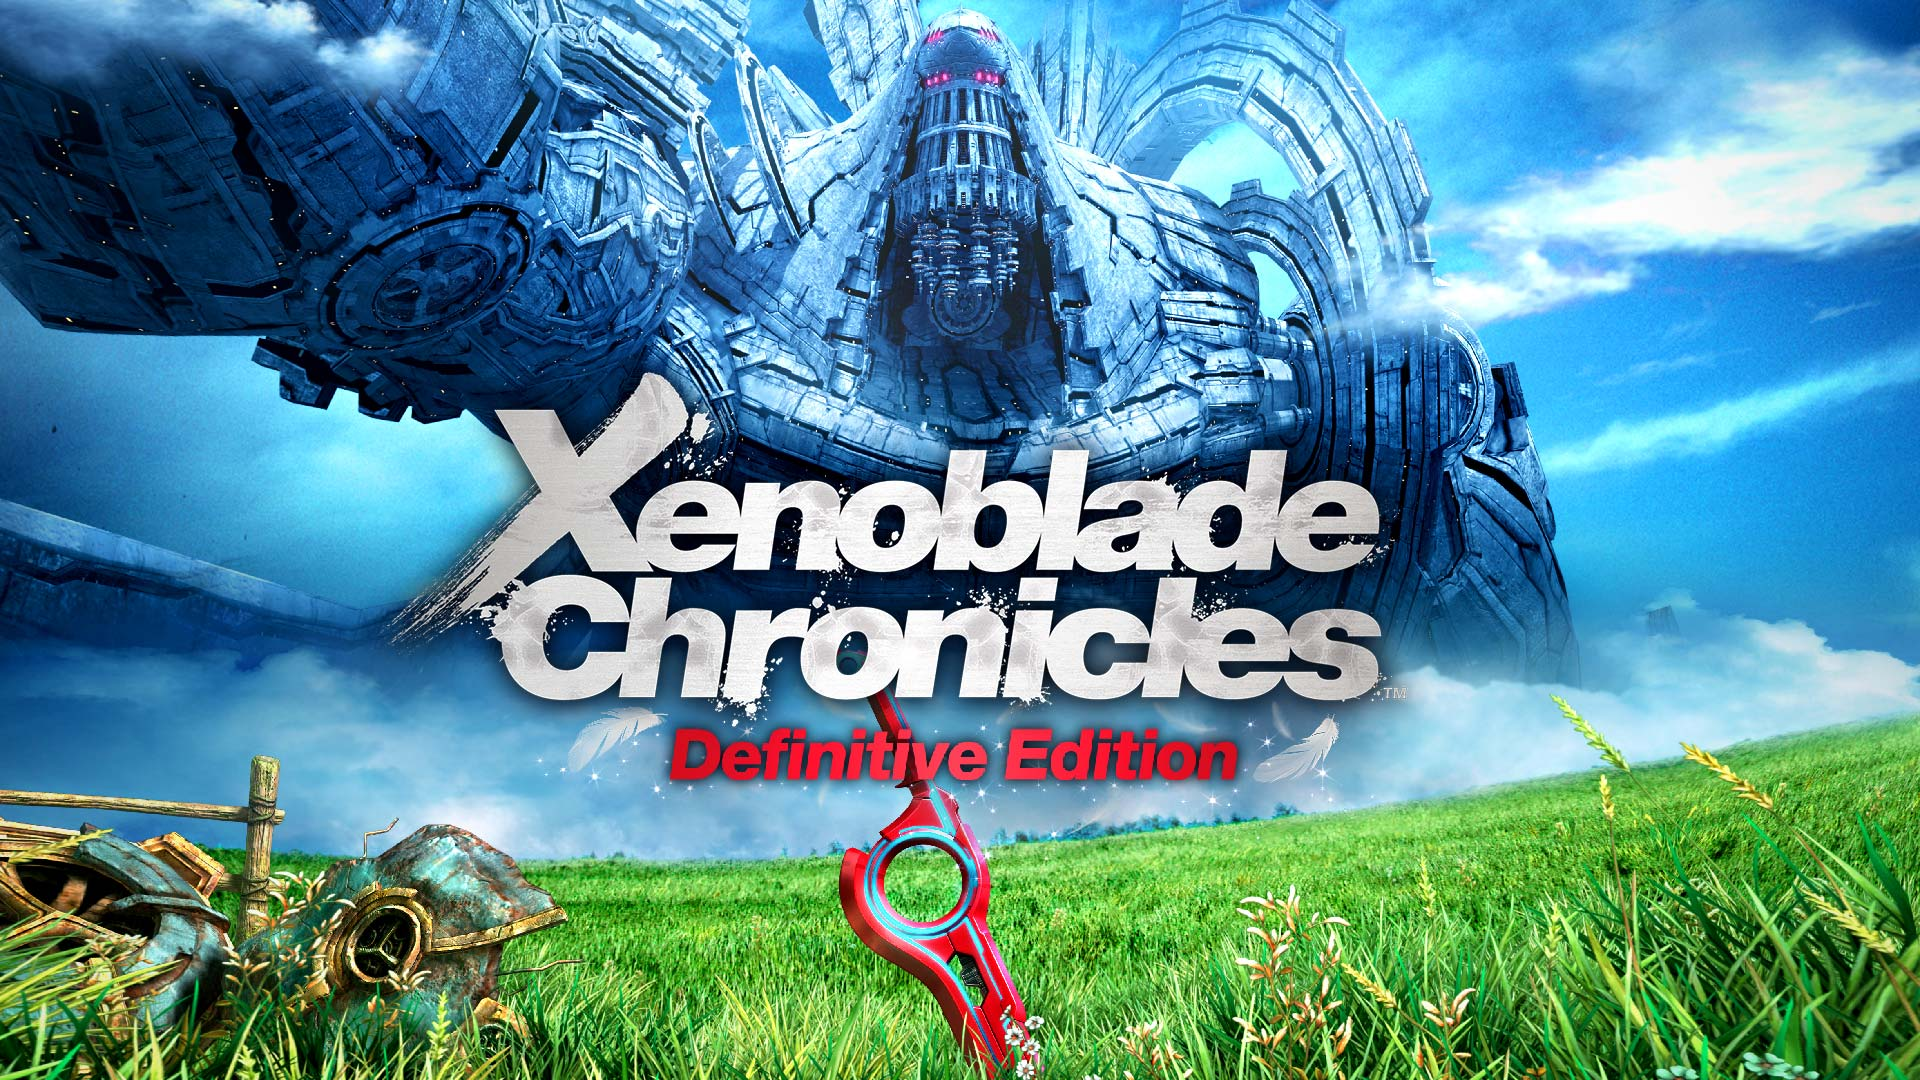 xenoblade chronicles, skip cutscenes